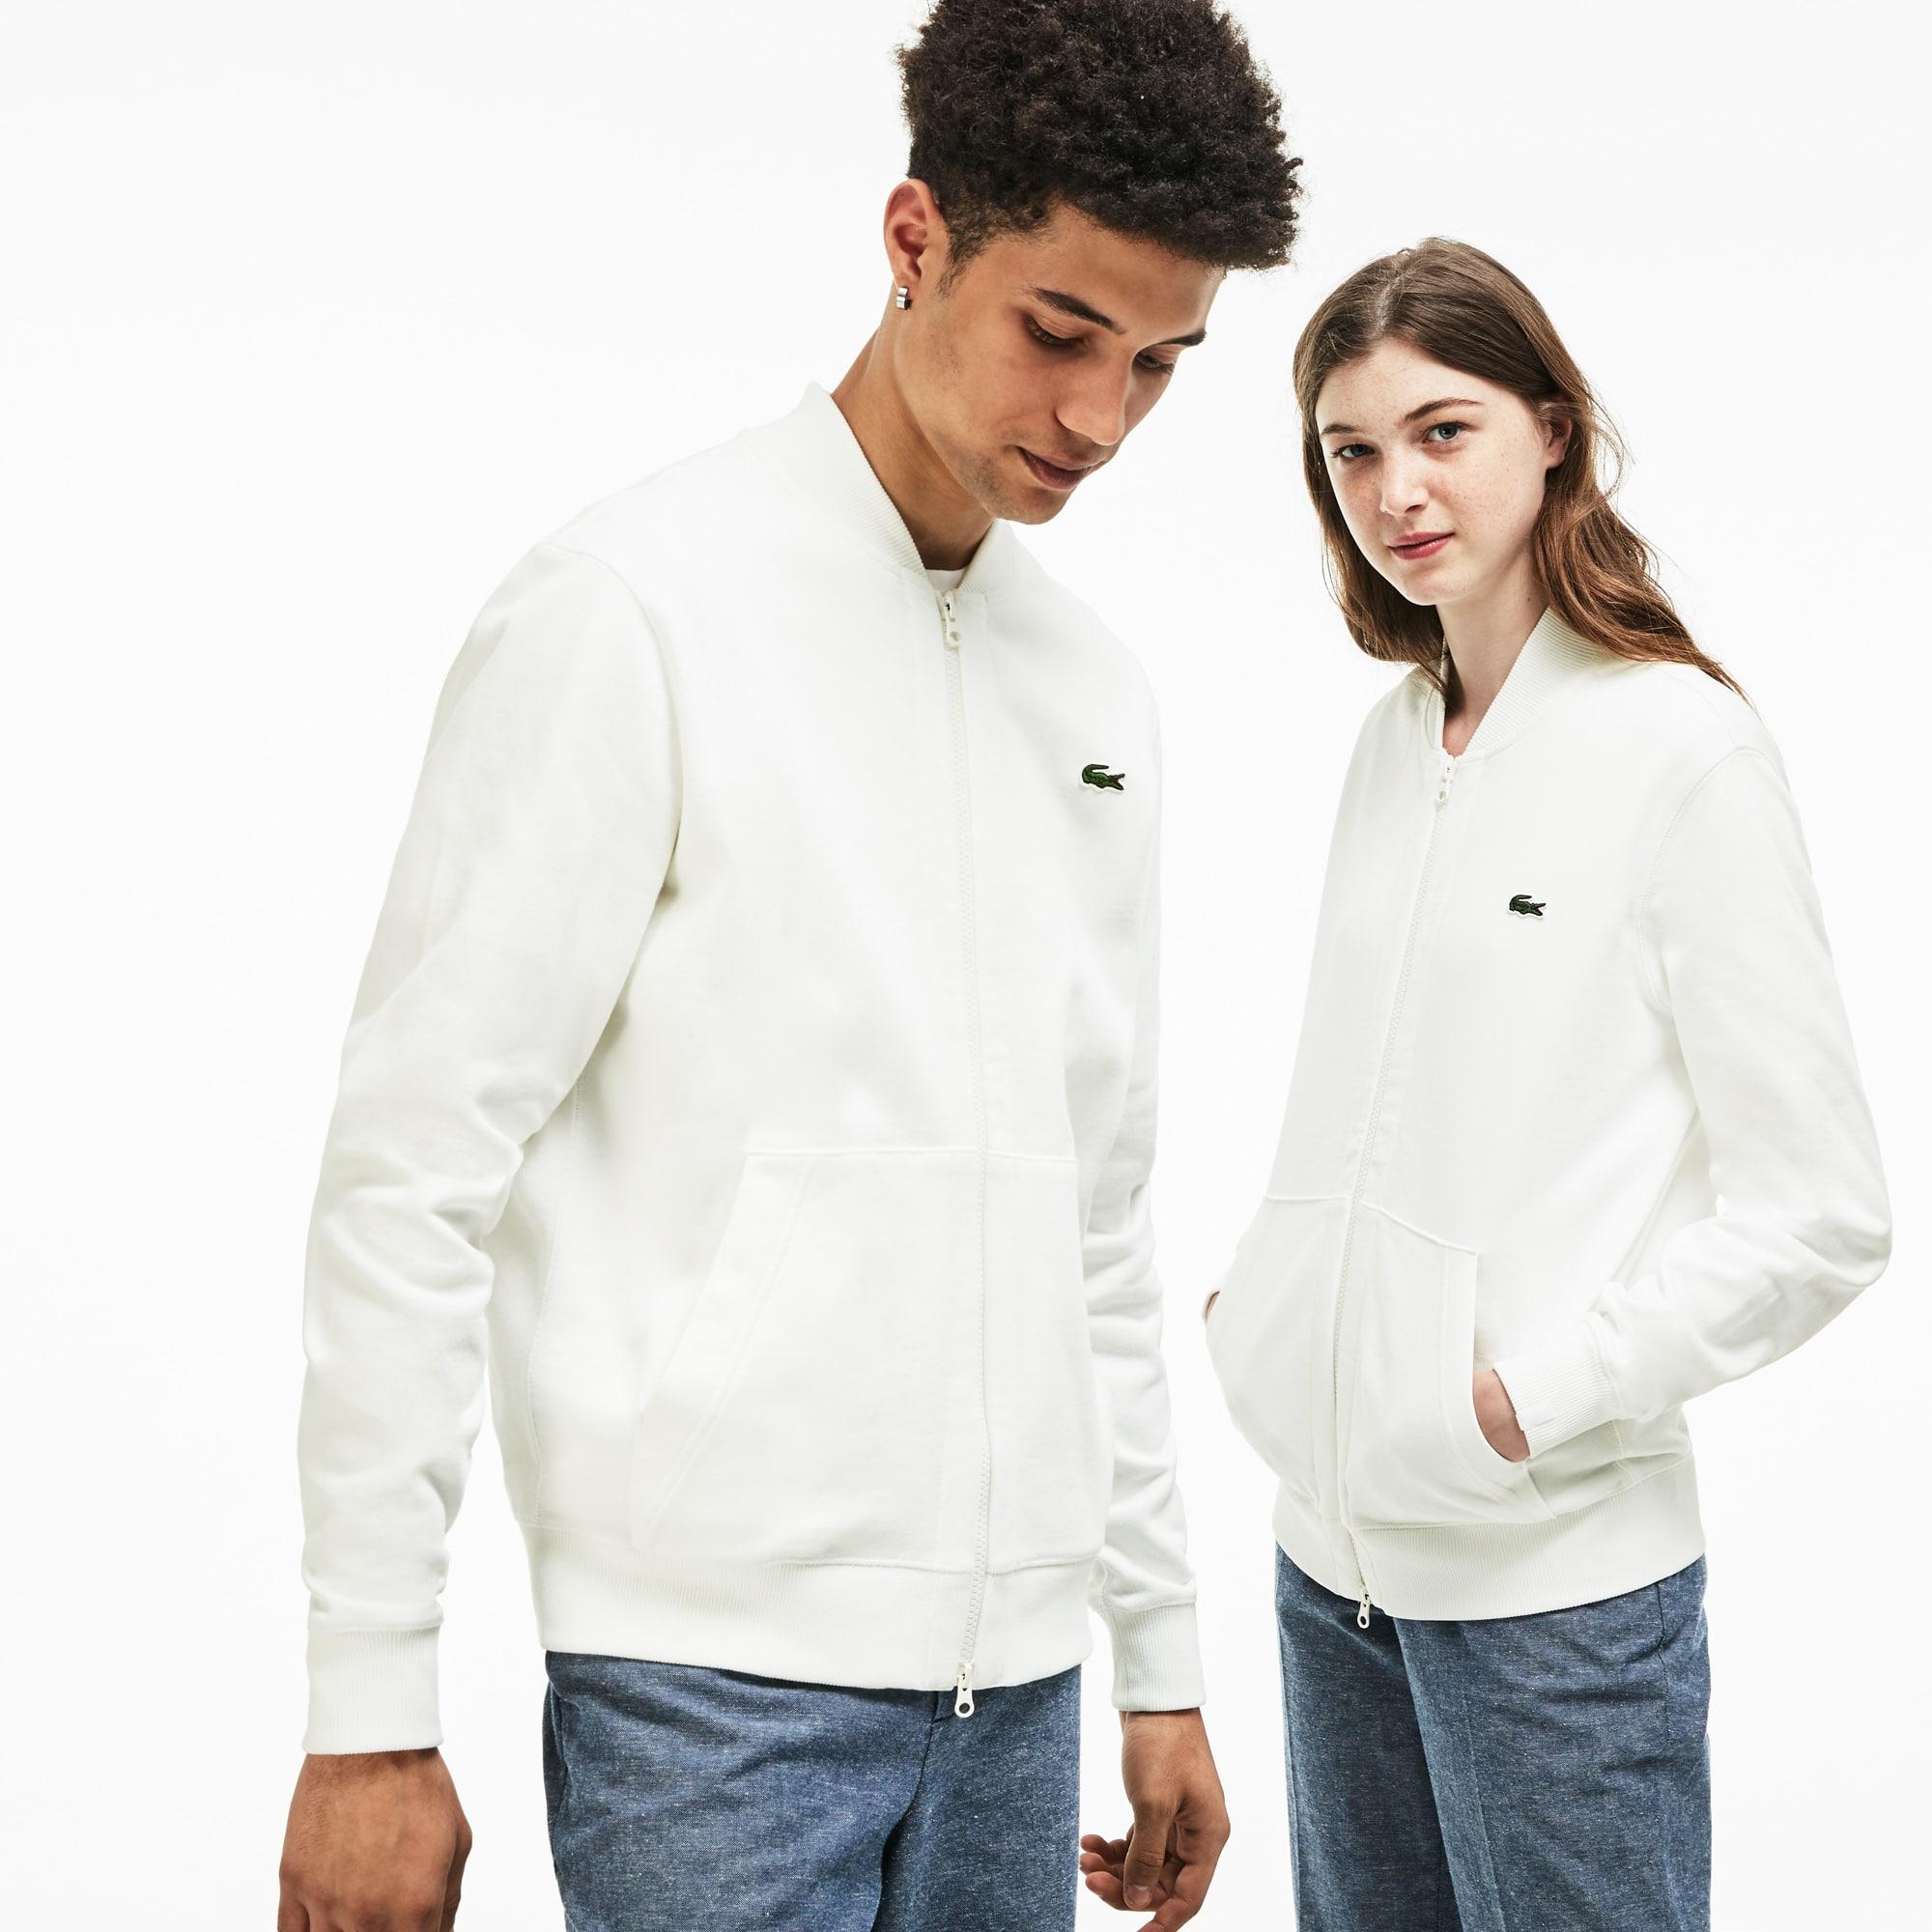 Unisex-Sweatshirt aus Fleece mit Bomberkragen LACOSTE L!VE